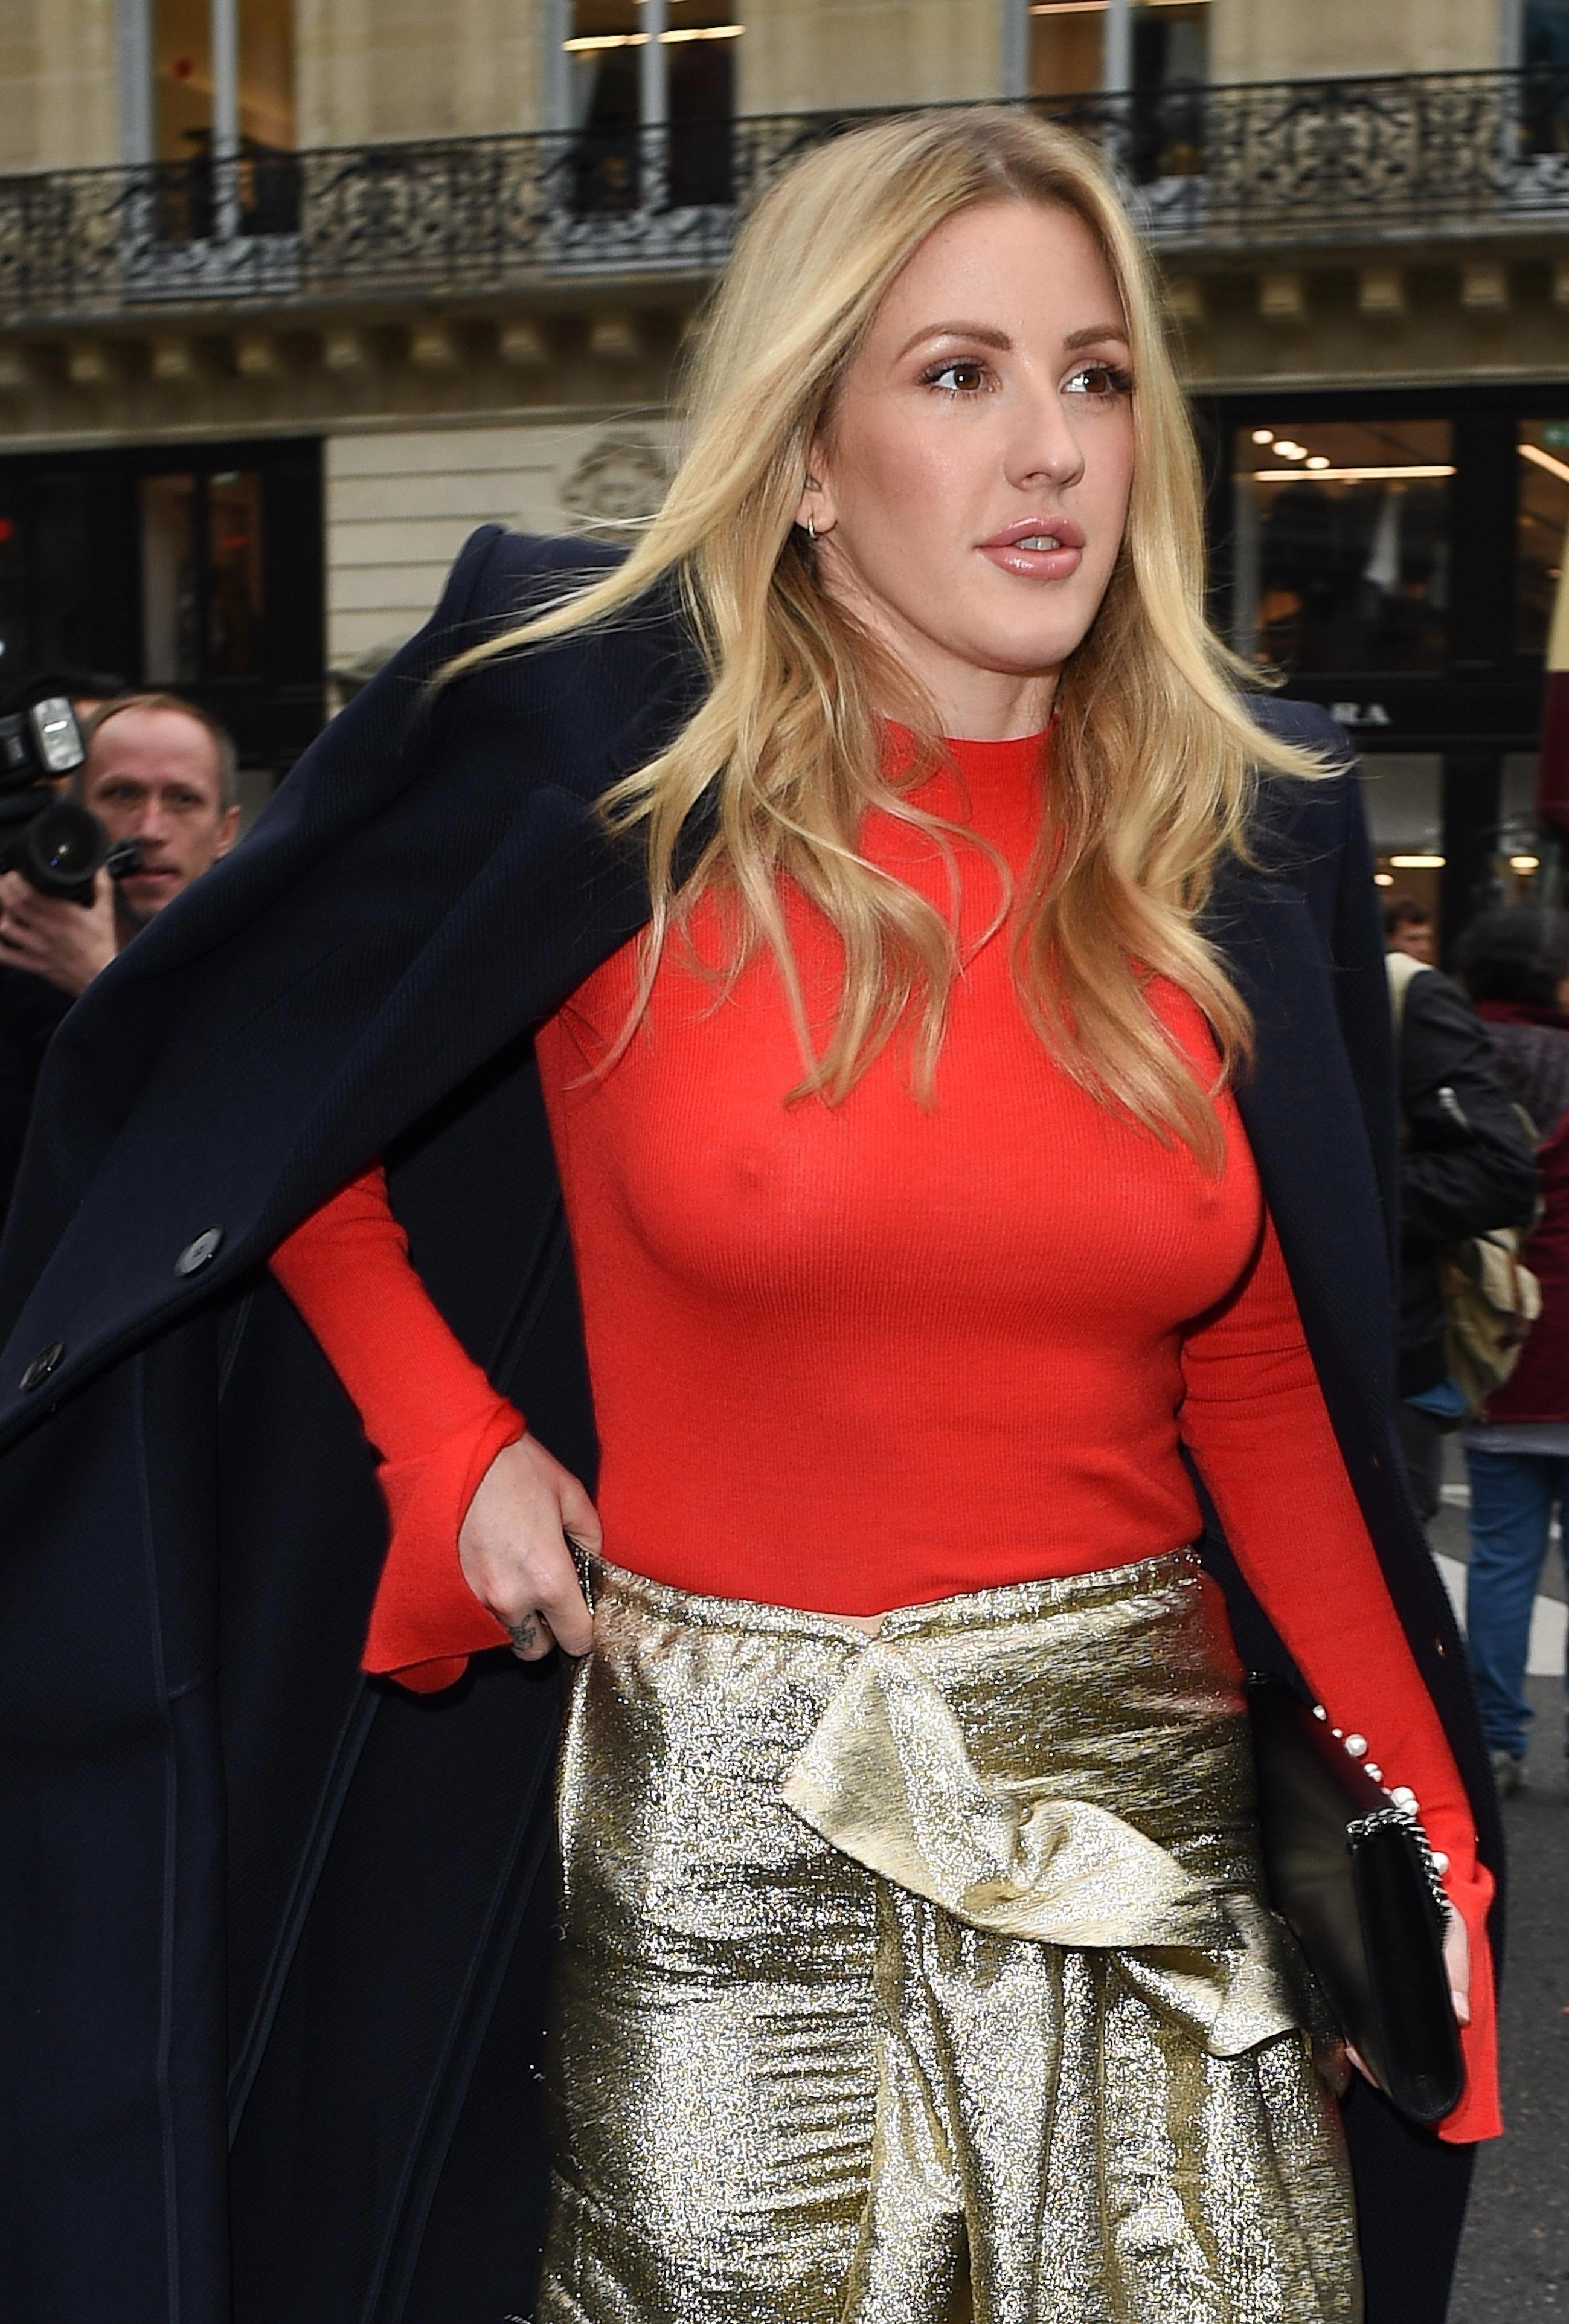 Alyssia McGoogan nude. 2018-2019 celebrityes photos leaks! picture